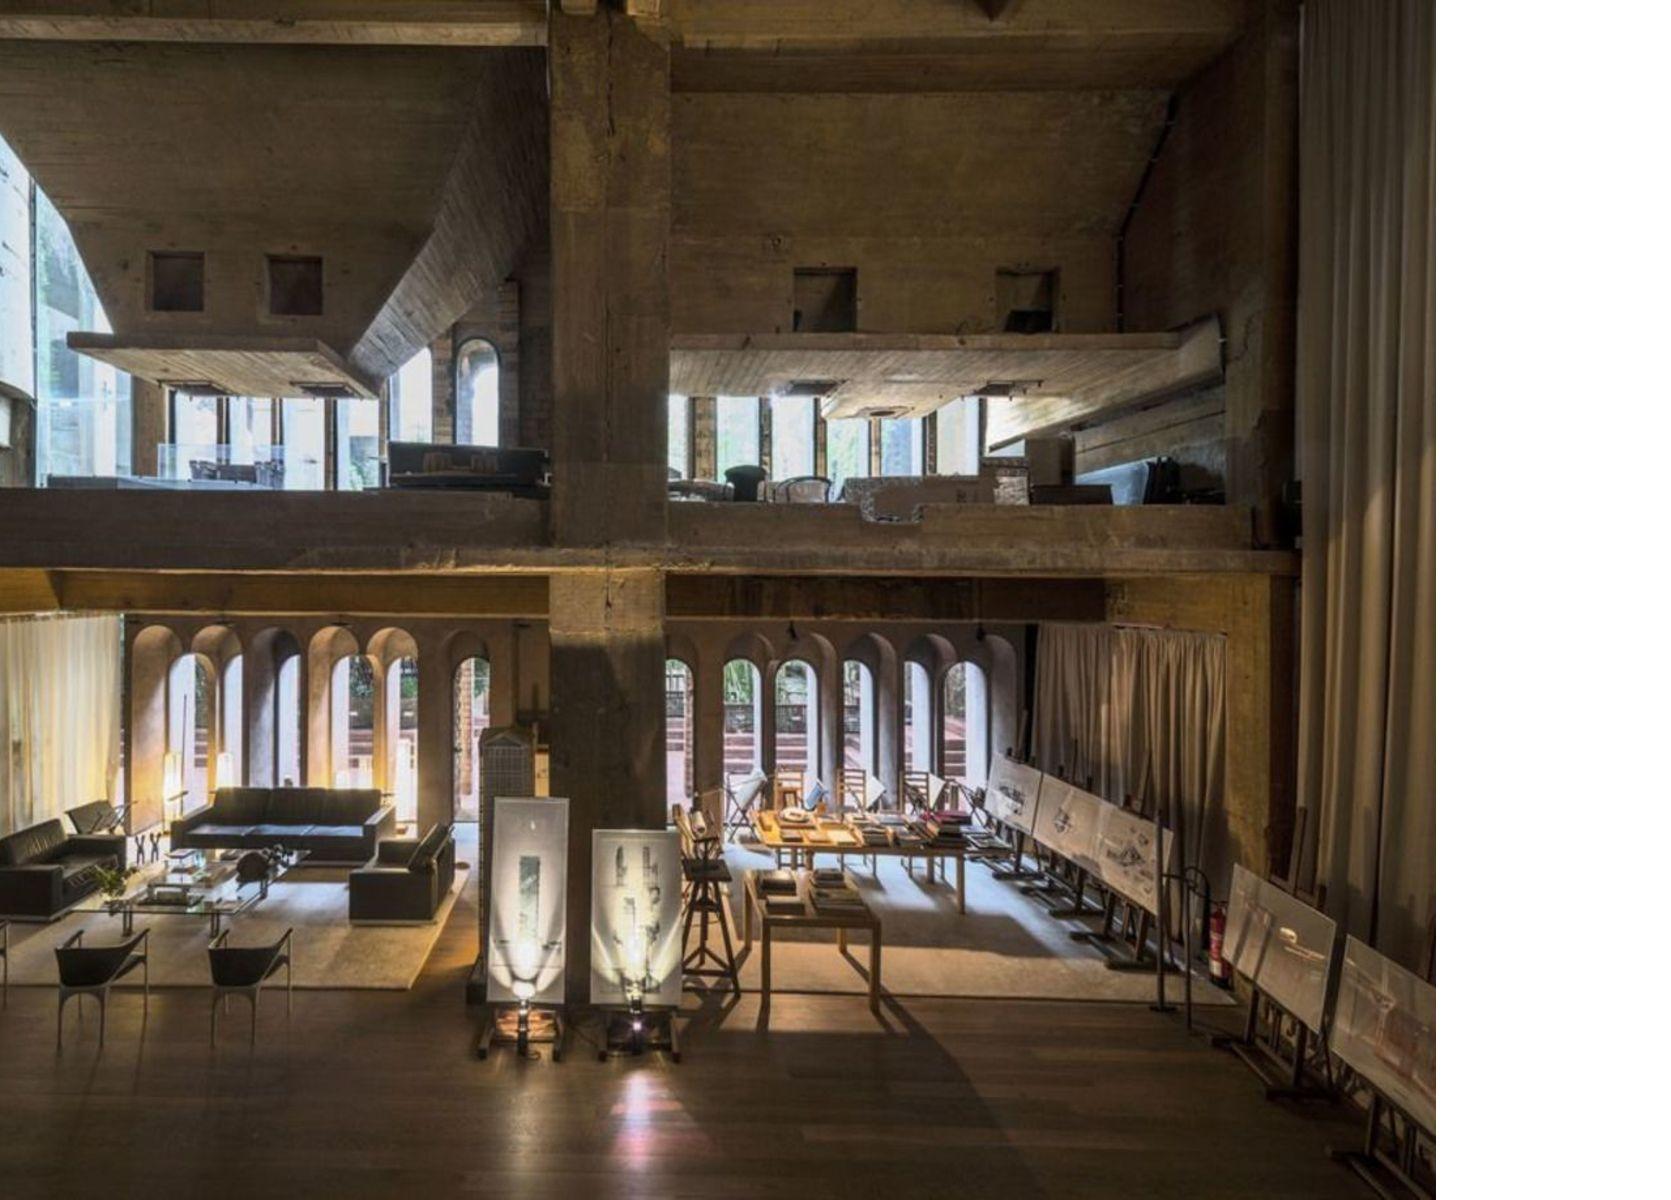 Ricardo Bofill und La Fàbrica, das Büro in einer ehemaligem Zementfabrik